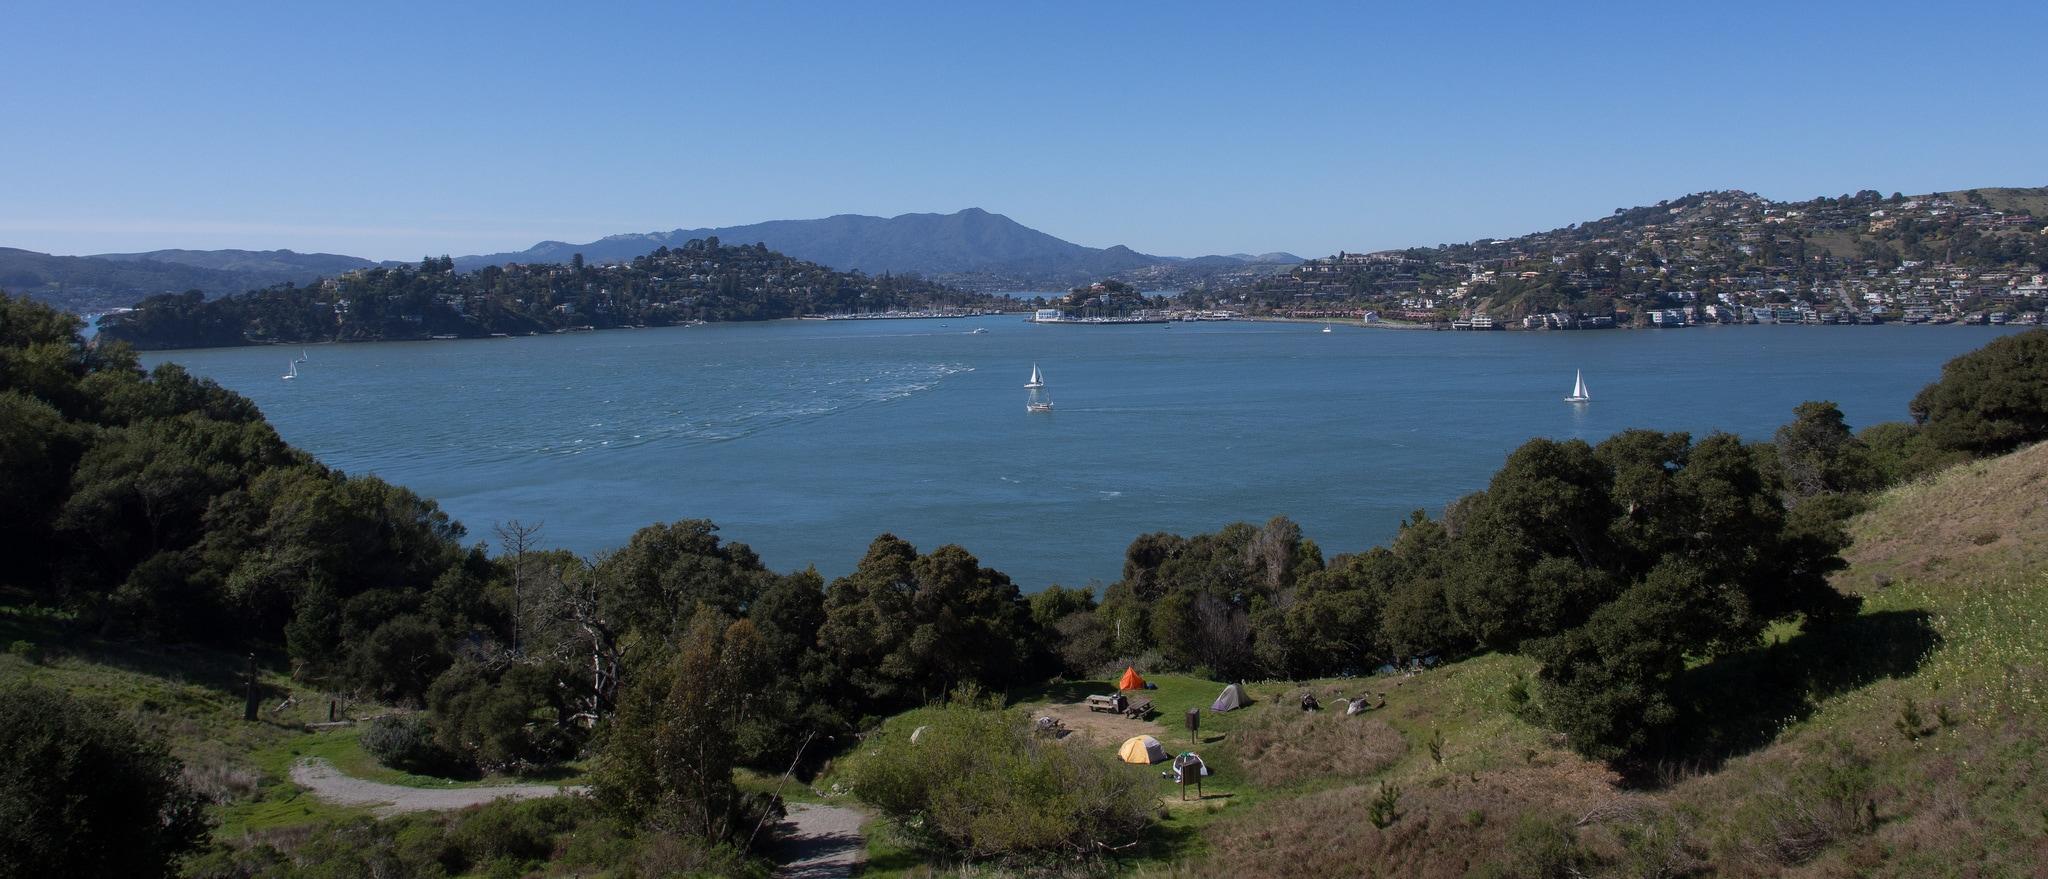 Best walkup campsites in California